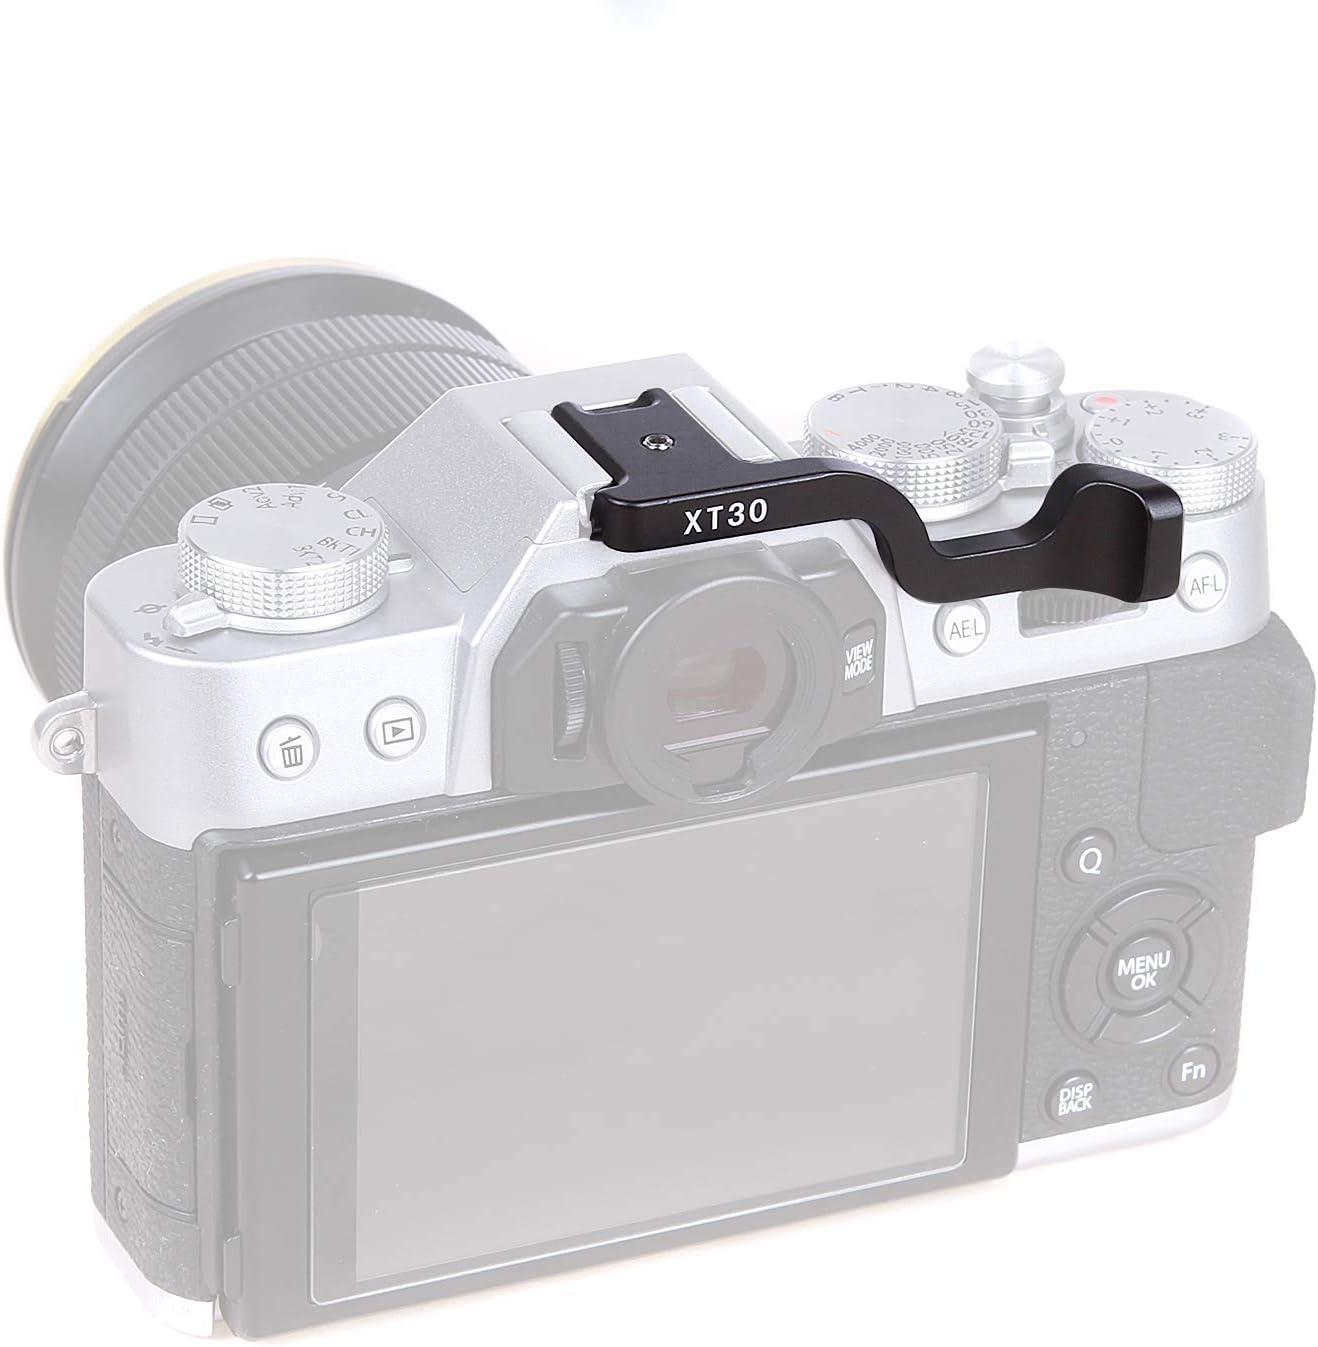 Foto4easy Metal Thumb Up Grip for Fujifilm Fuji XT30 Camera Black